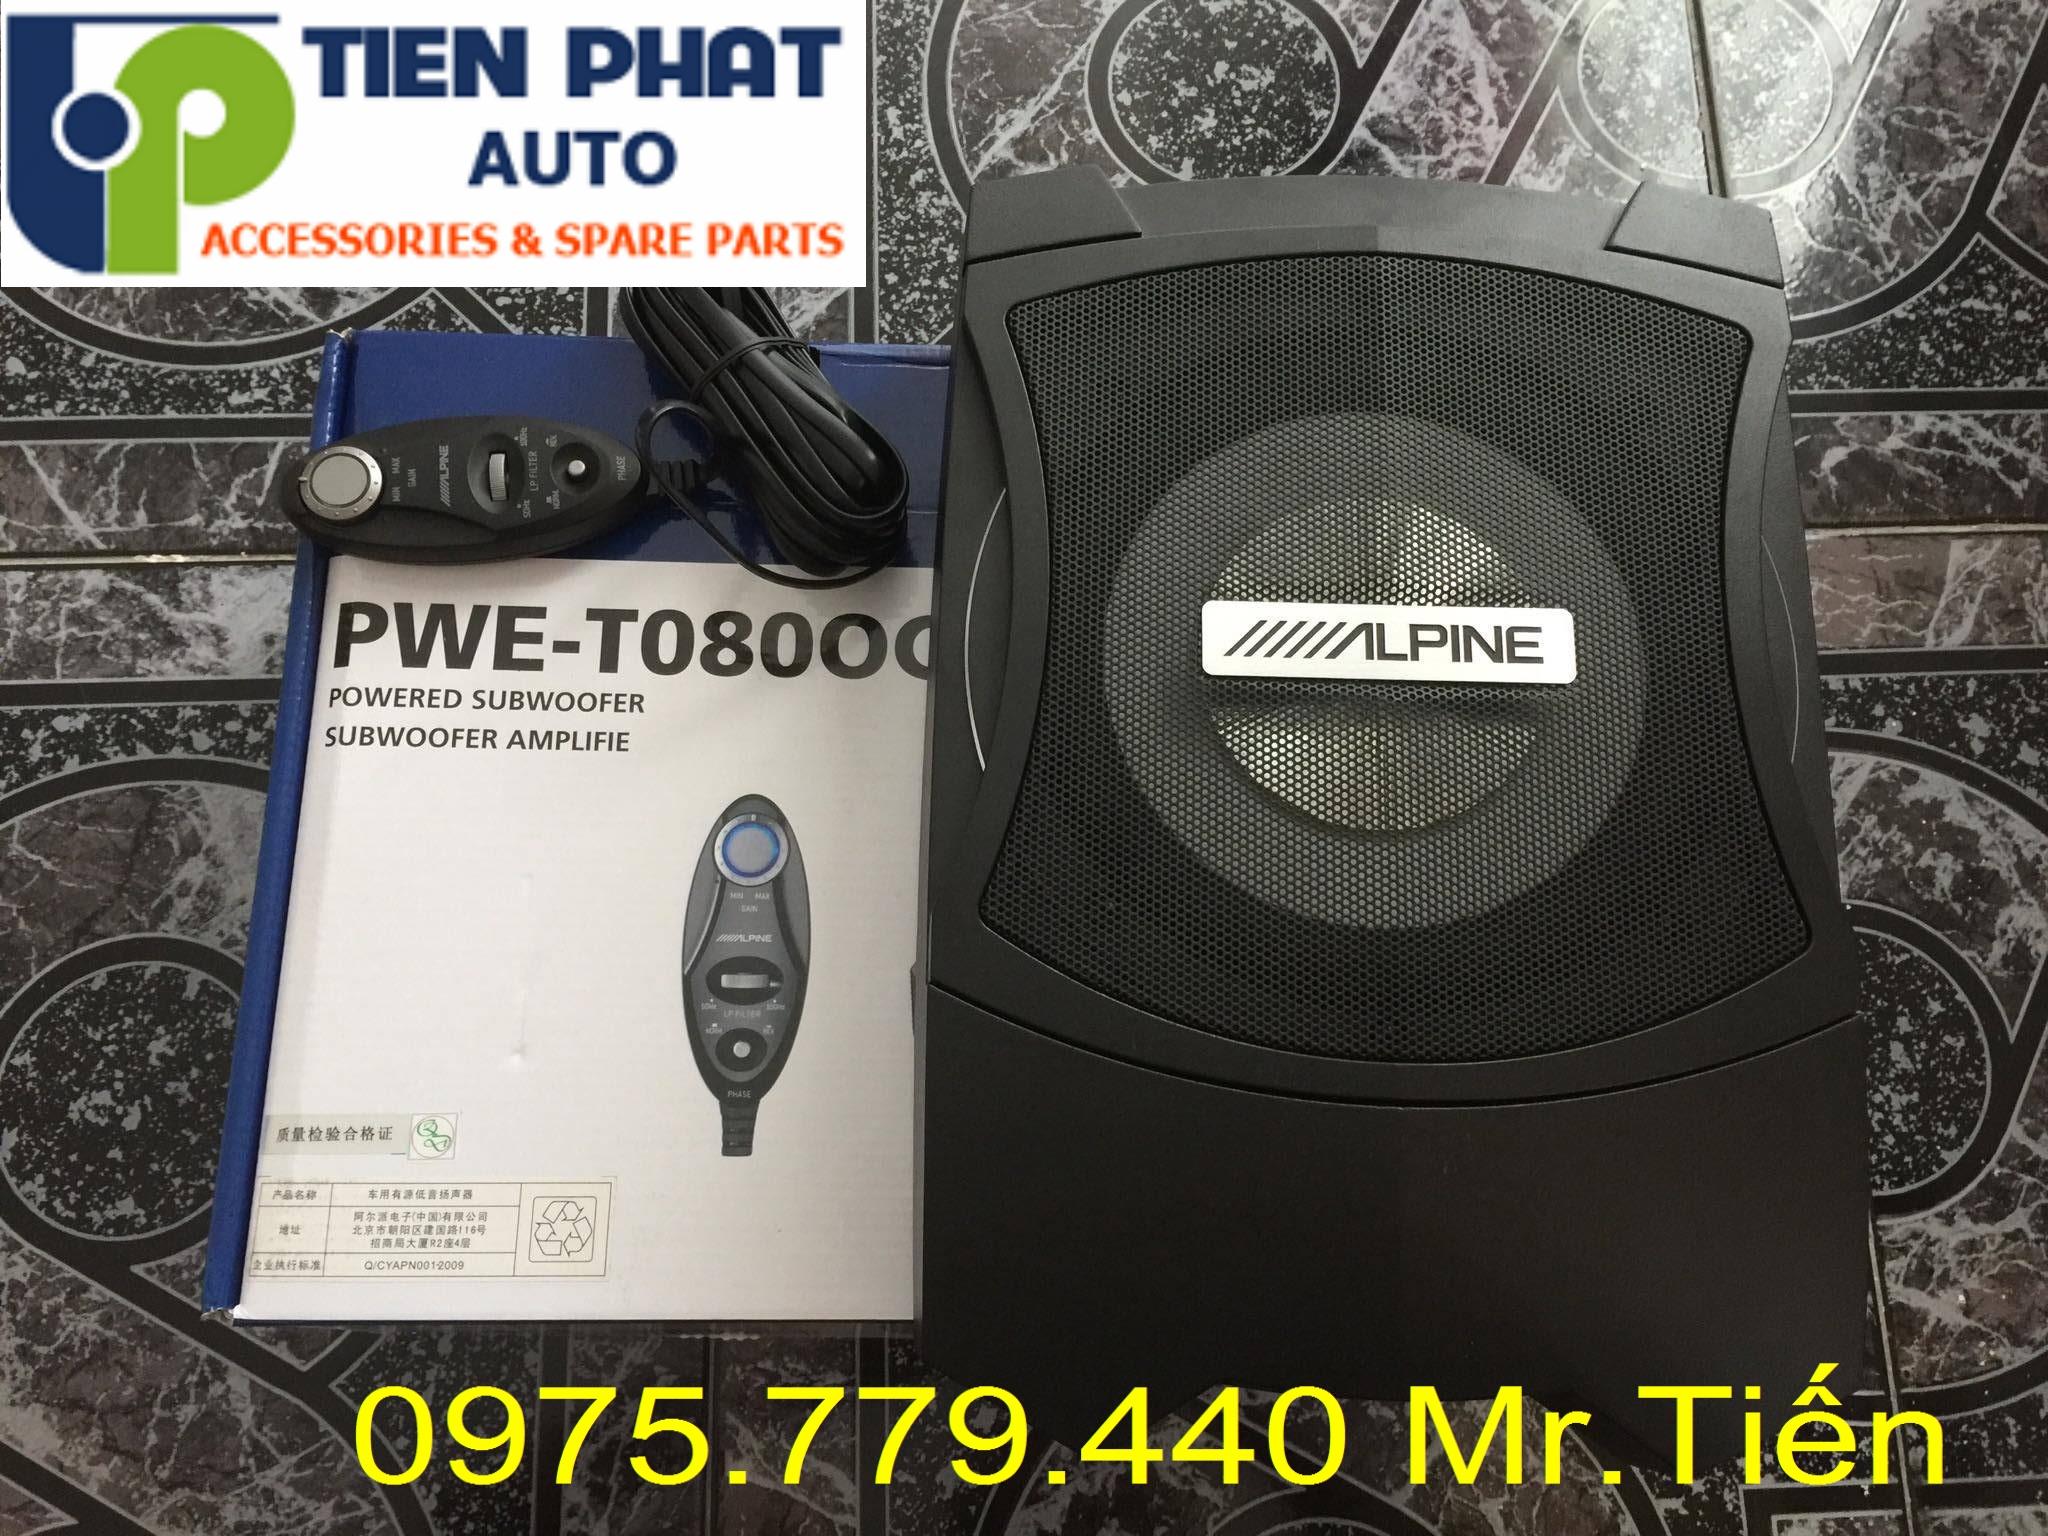 Lắp Loa sub Alpine PWE-T0800C cho Toyota Innova Lắp Đặt Tận Nơi